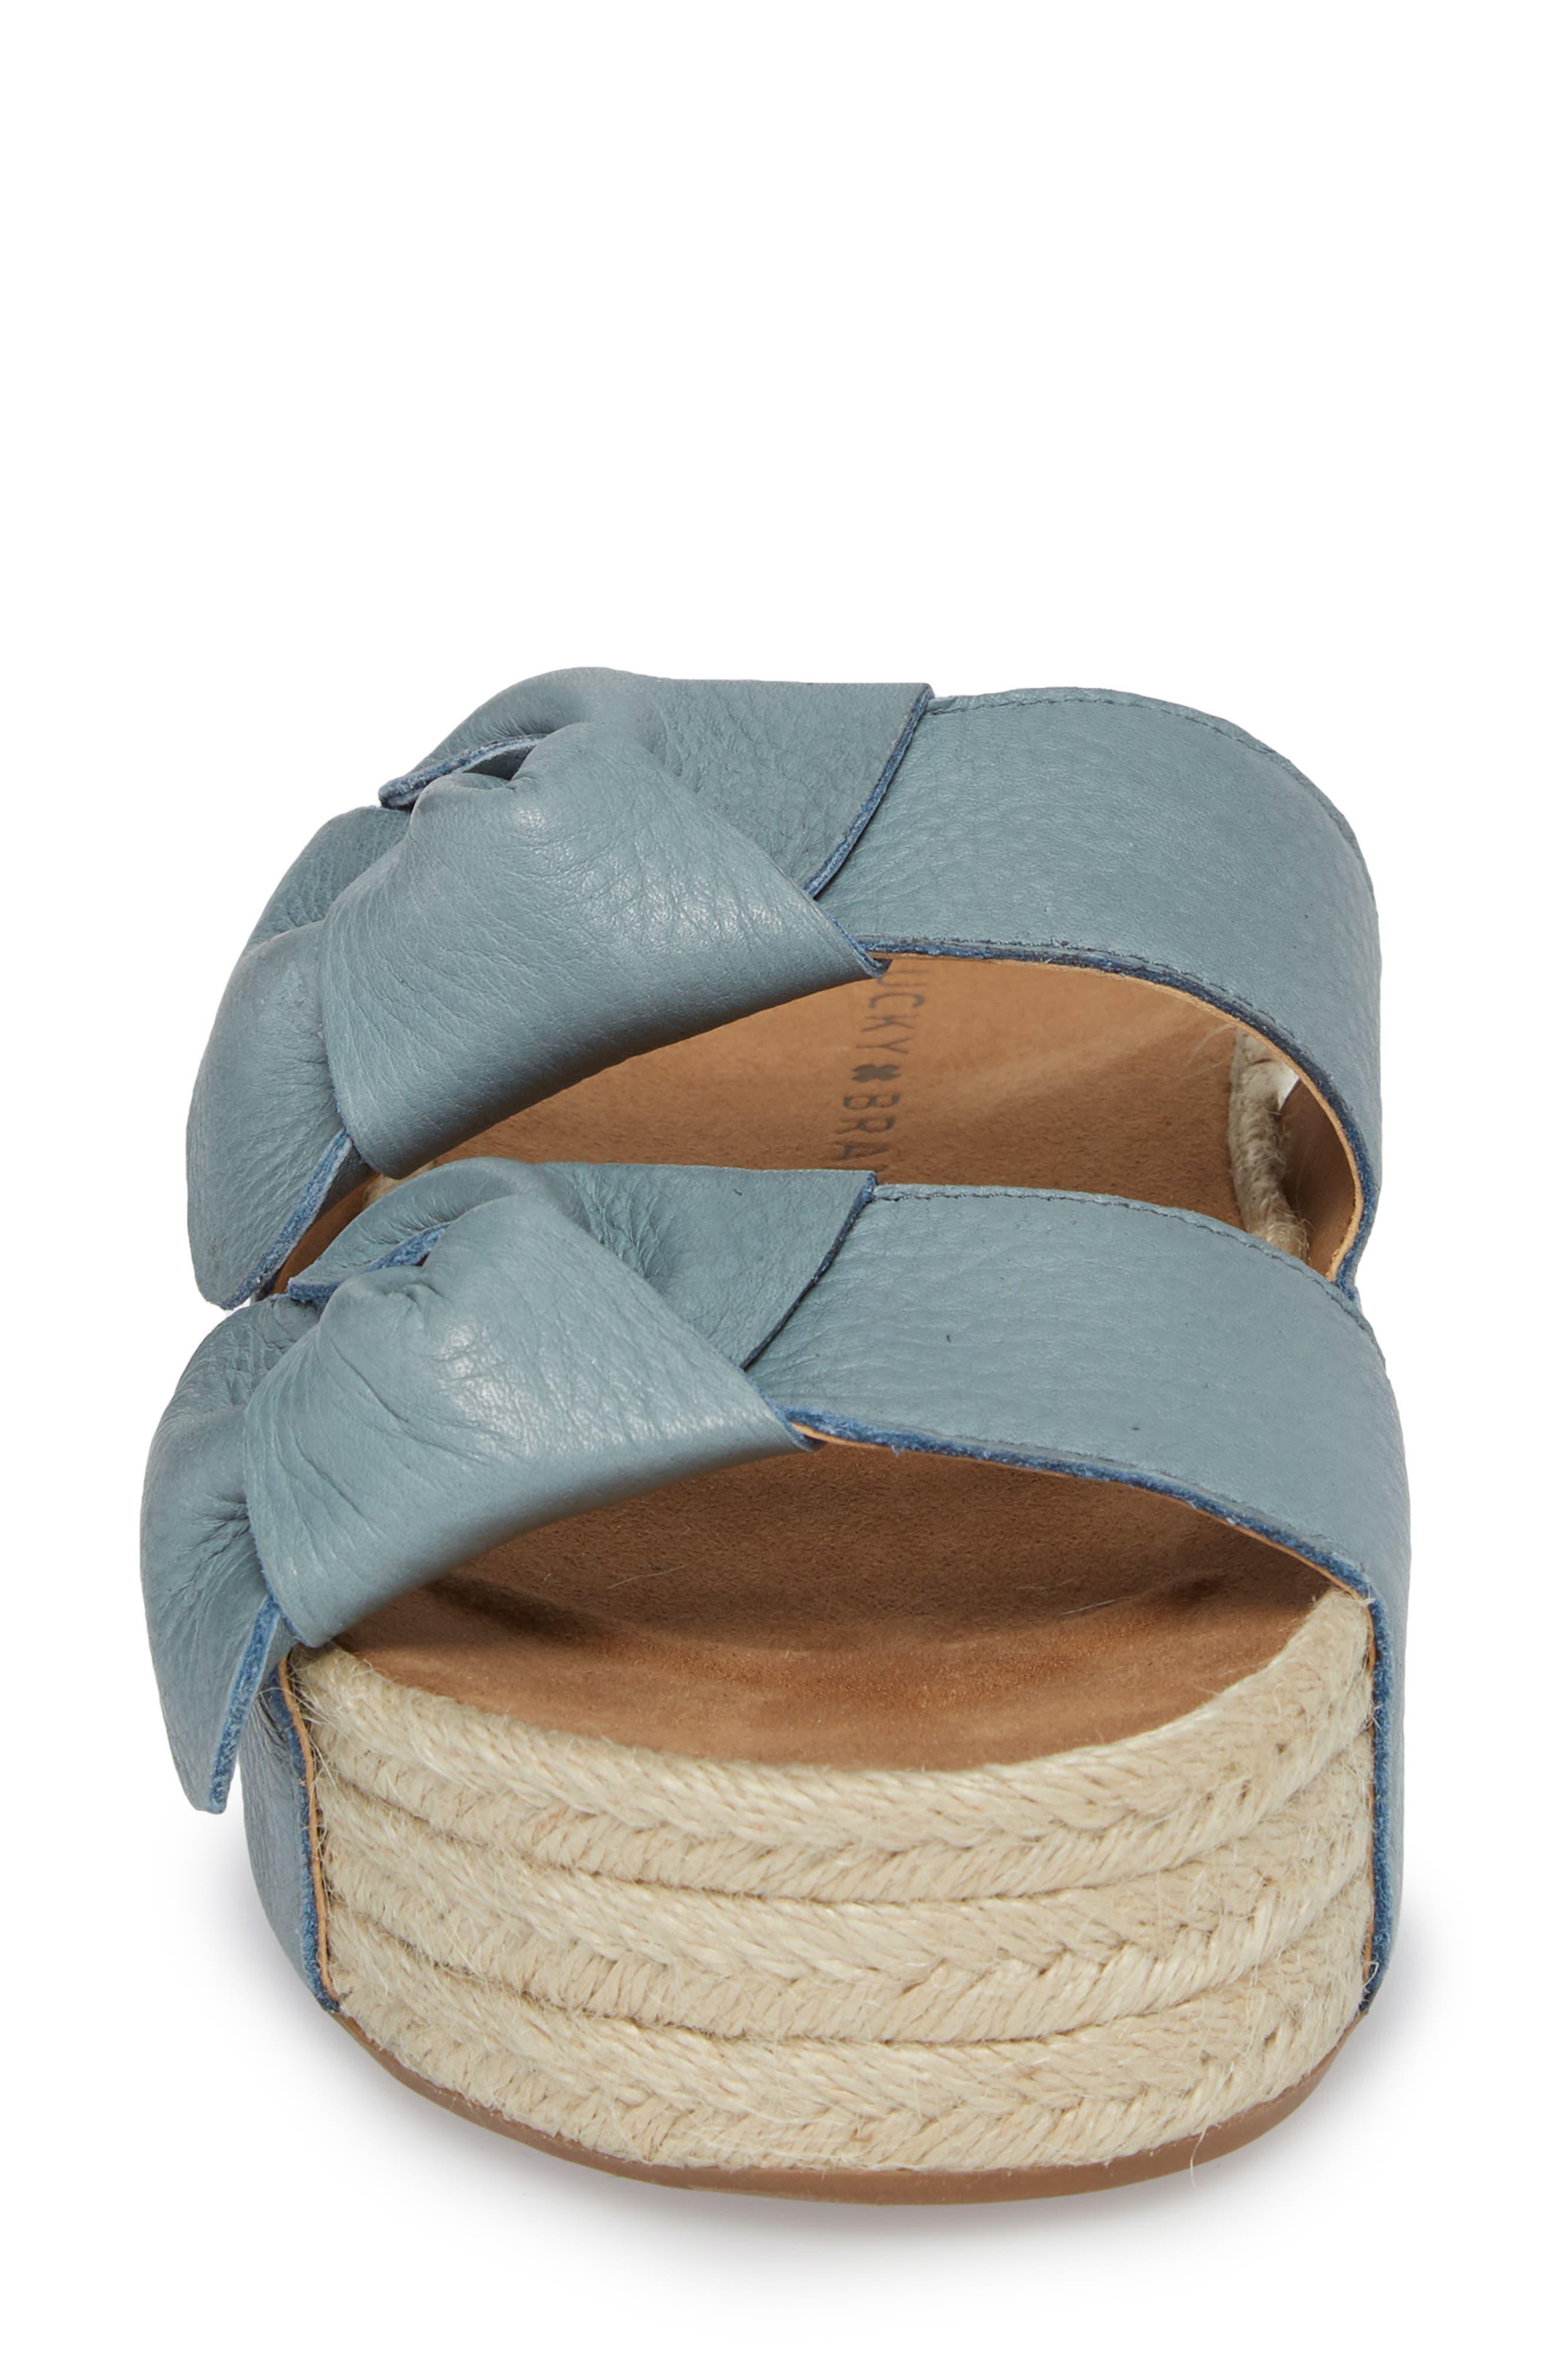 Izbremma Platform Espadrille Sandal,                             Alternate thumbnail 4, color,                             Infinity Leather